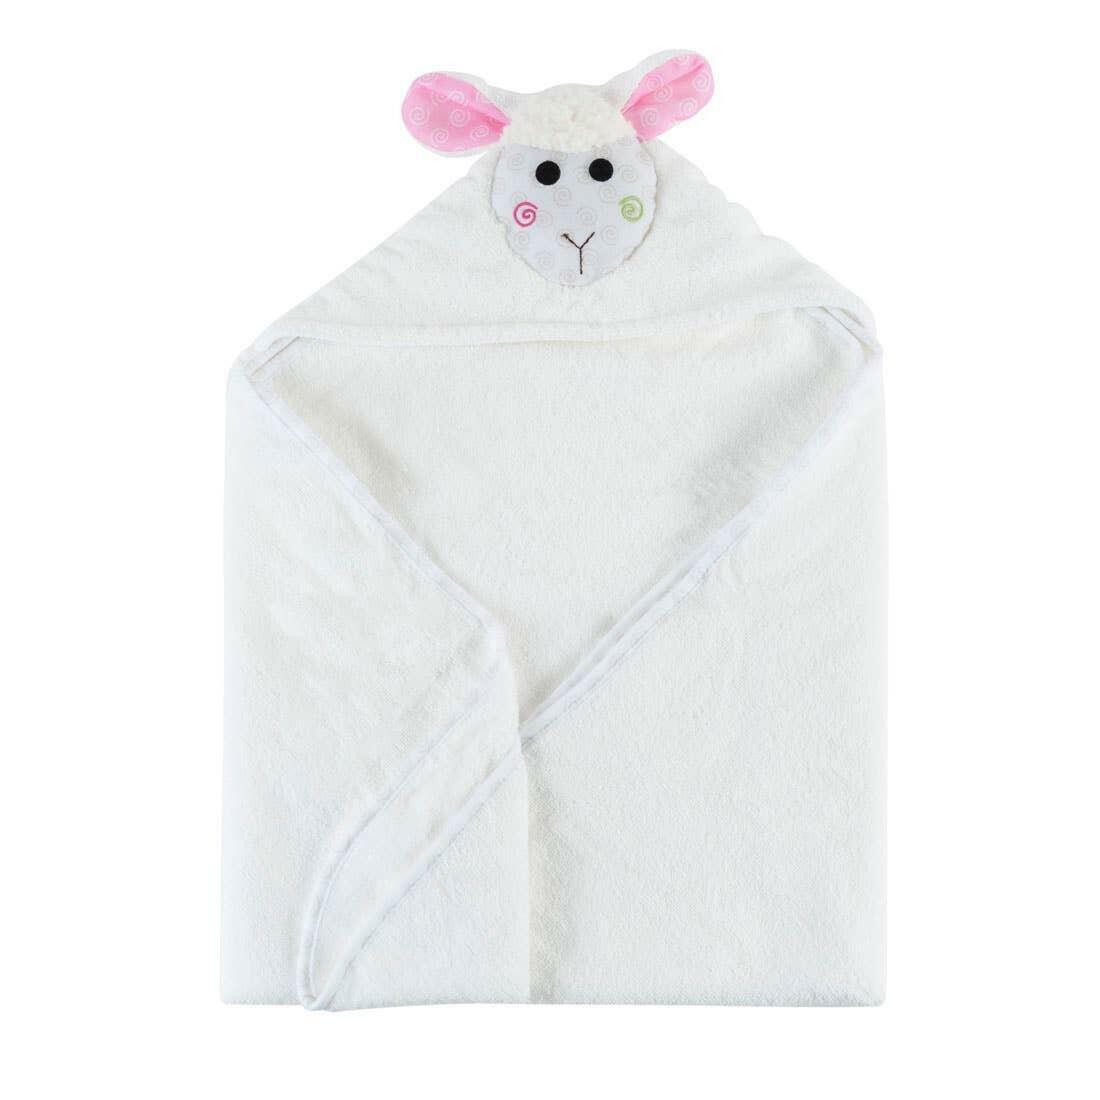 Lola the Lamb Baby Towel | Trada Marketplace